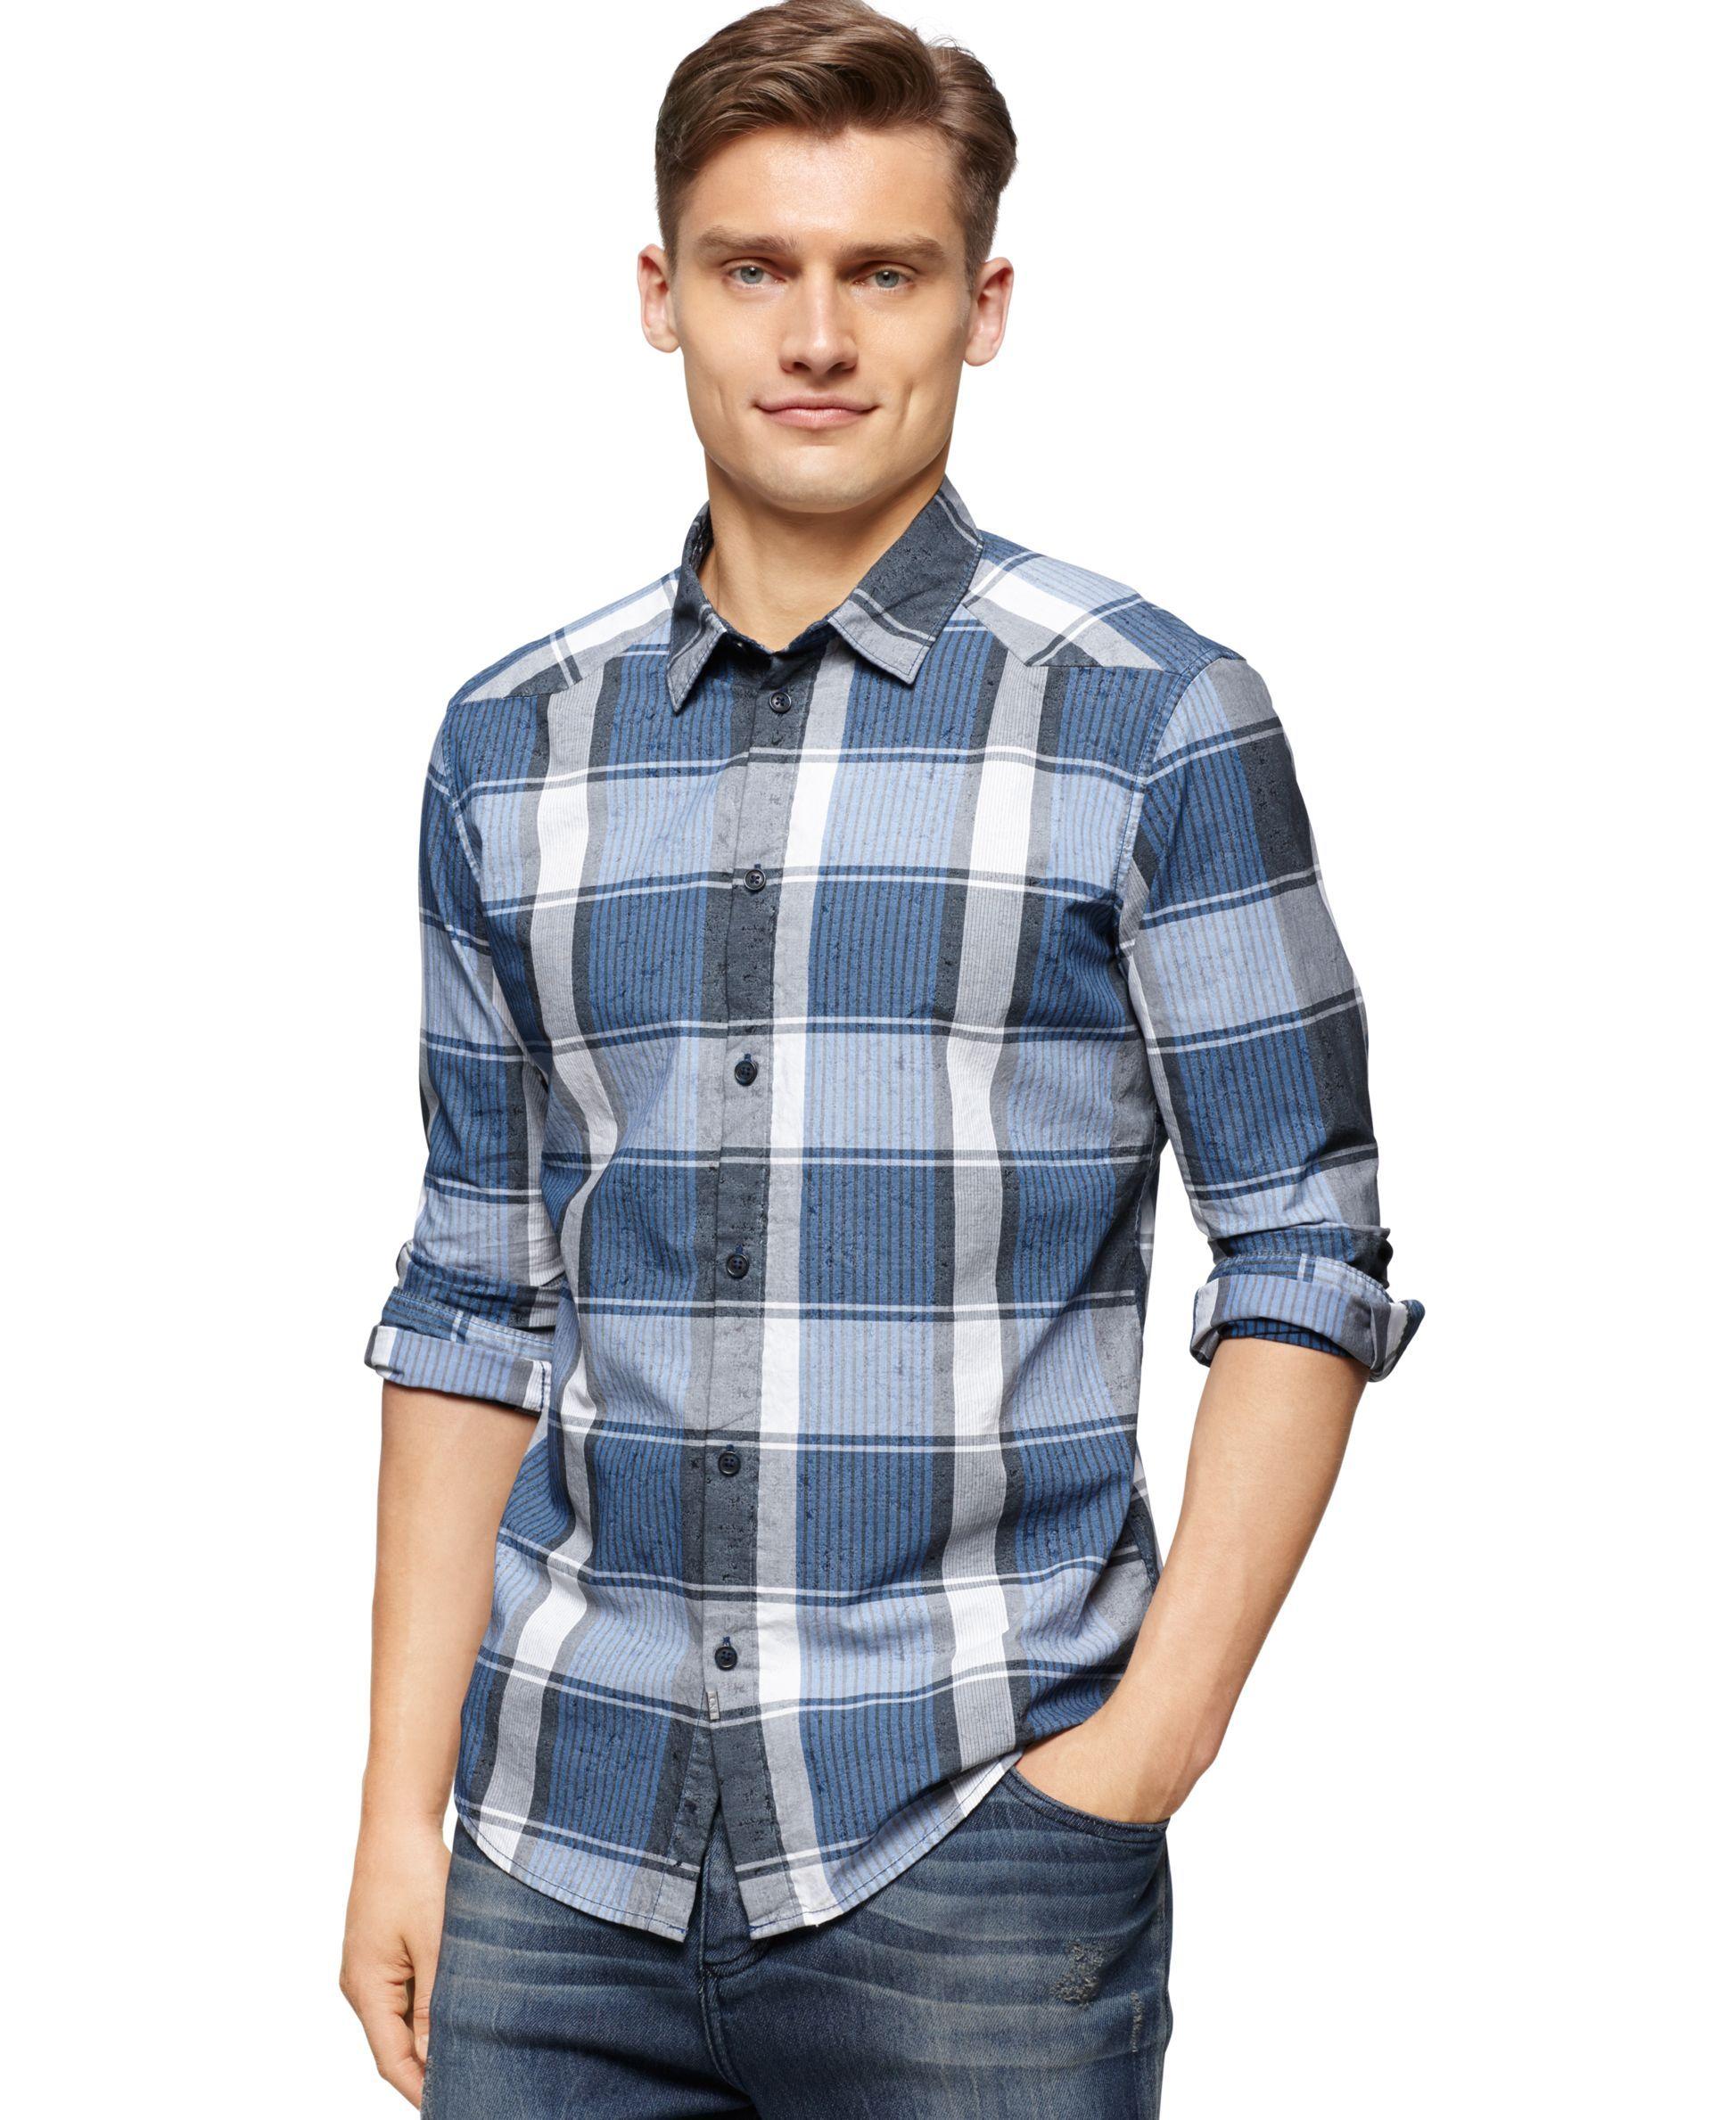 Calvin Klein Indigo Plaid Shirt  Products  Pinterest  Products